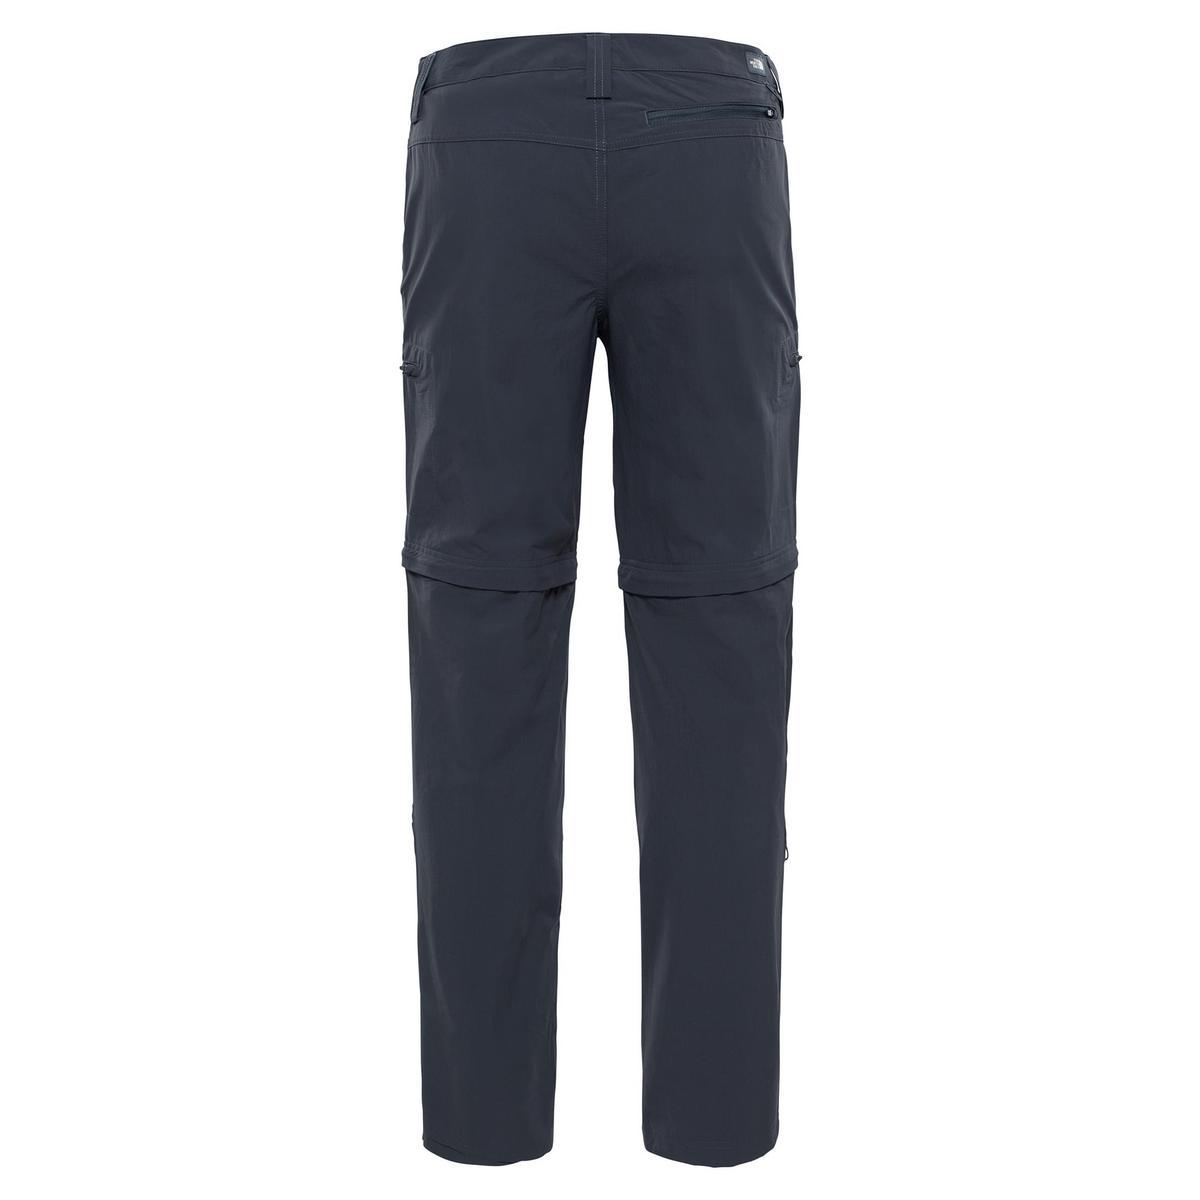 The North Face Men's Exploration Convertible Trousers - Short